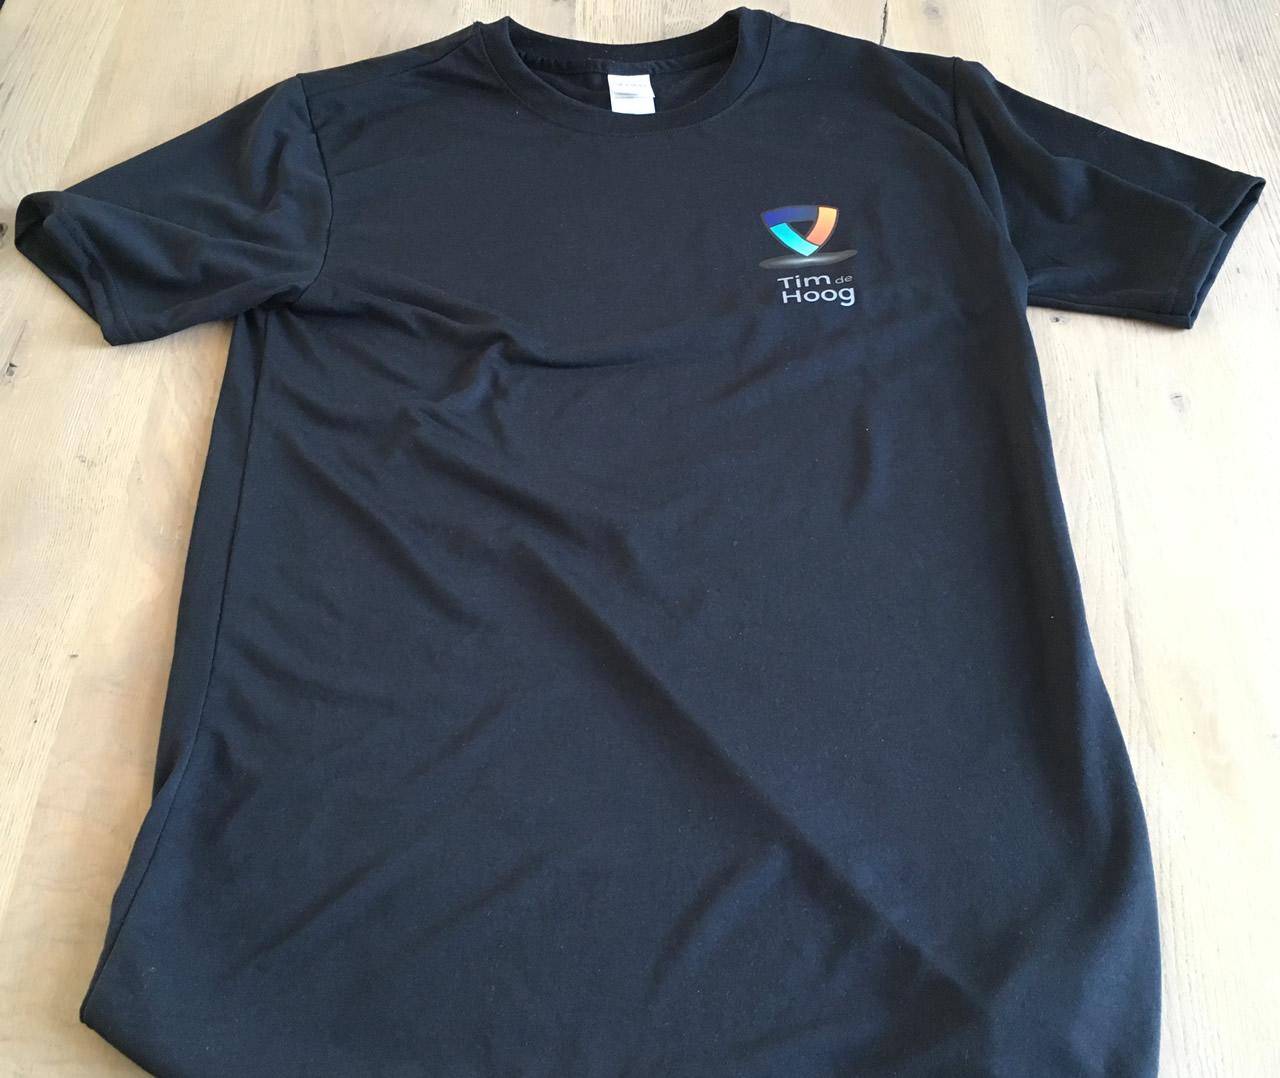 Timdehoog.nl sport T-shirt voorkant.